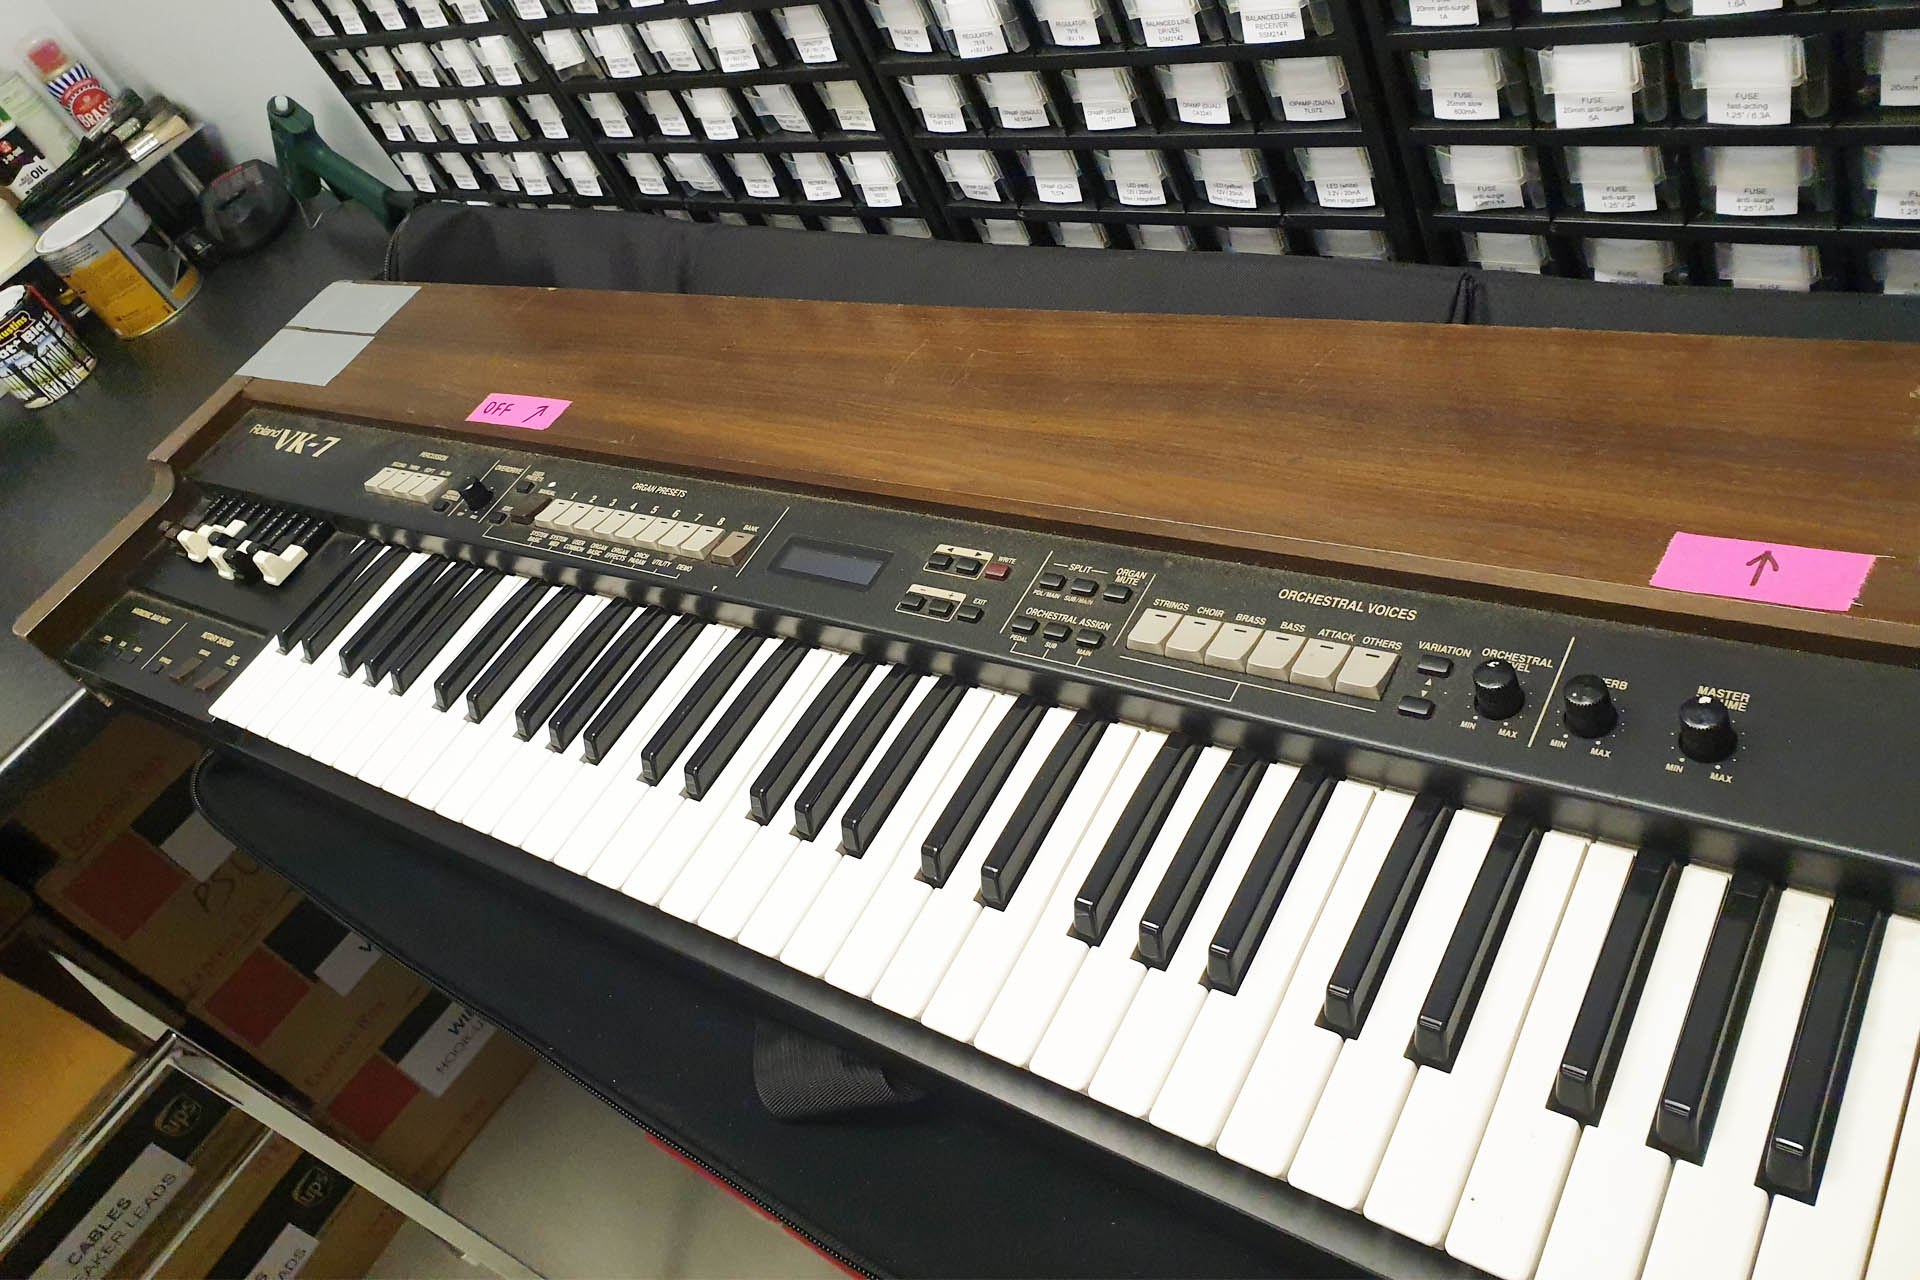 Roland VK-7 transformer power supply fix at Plasma Music - keyboard repairs in Hertfordshire